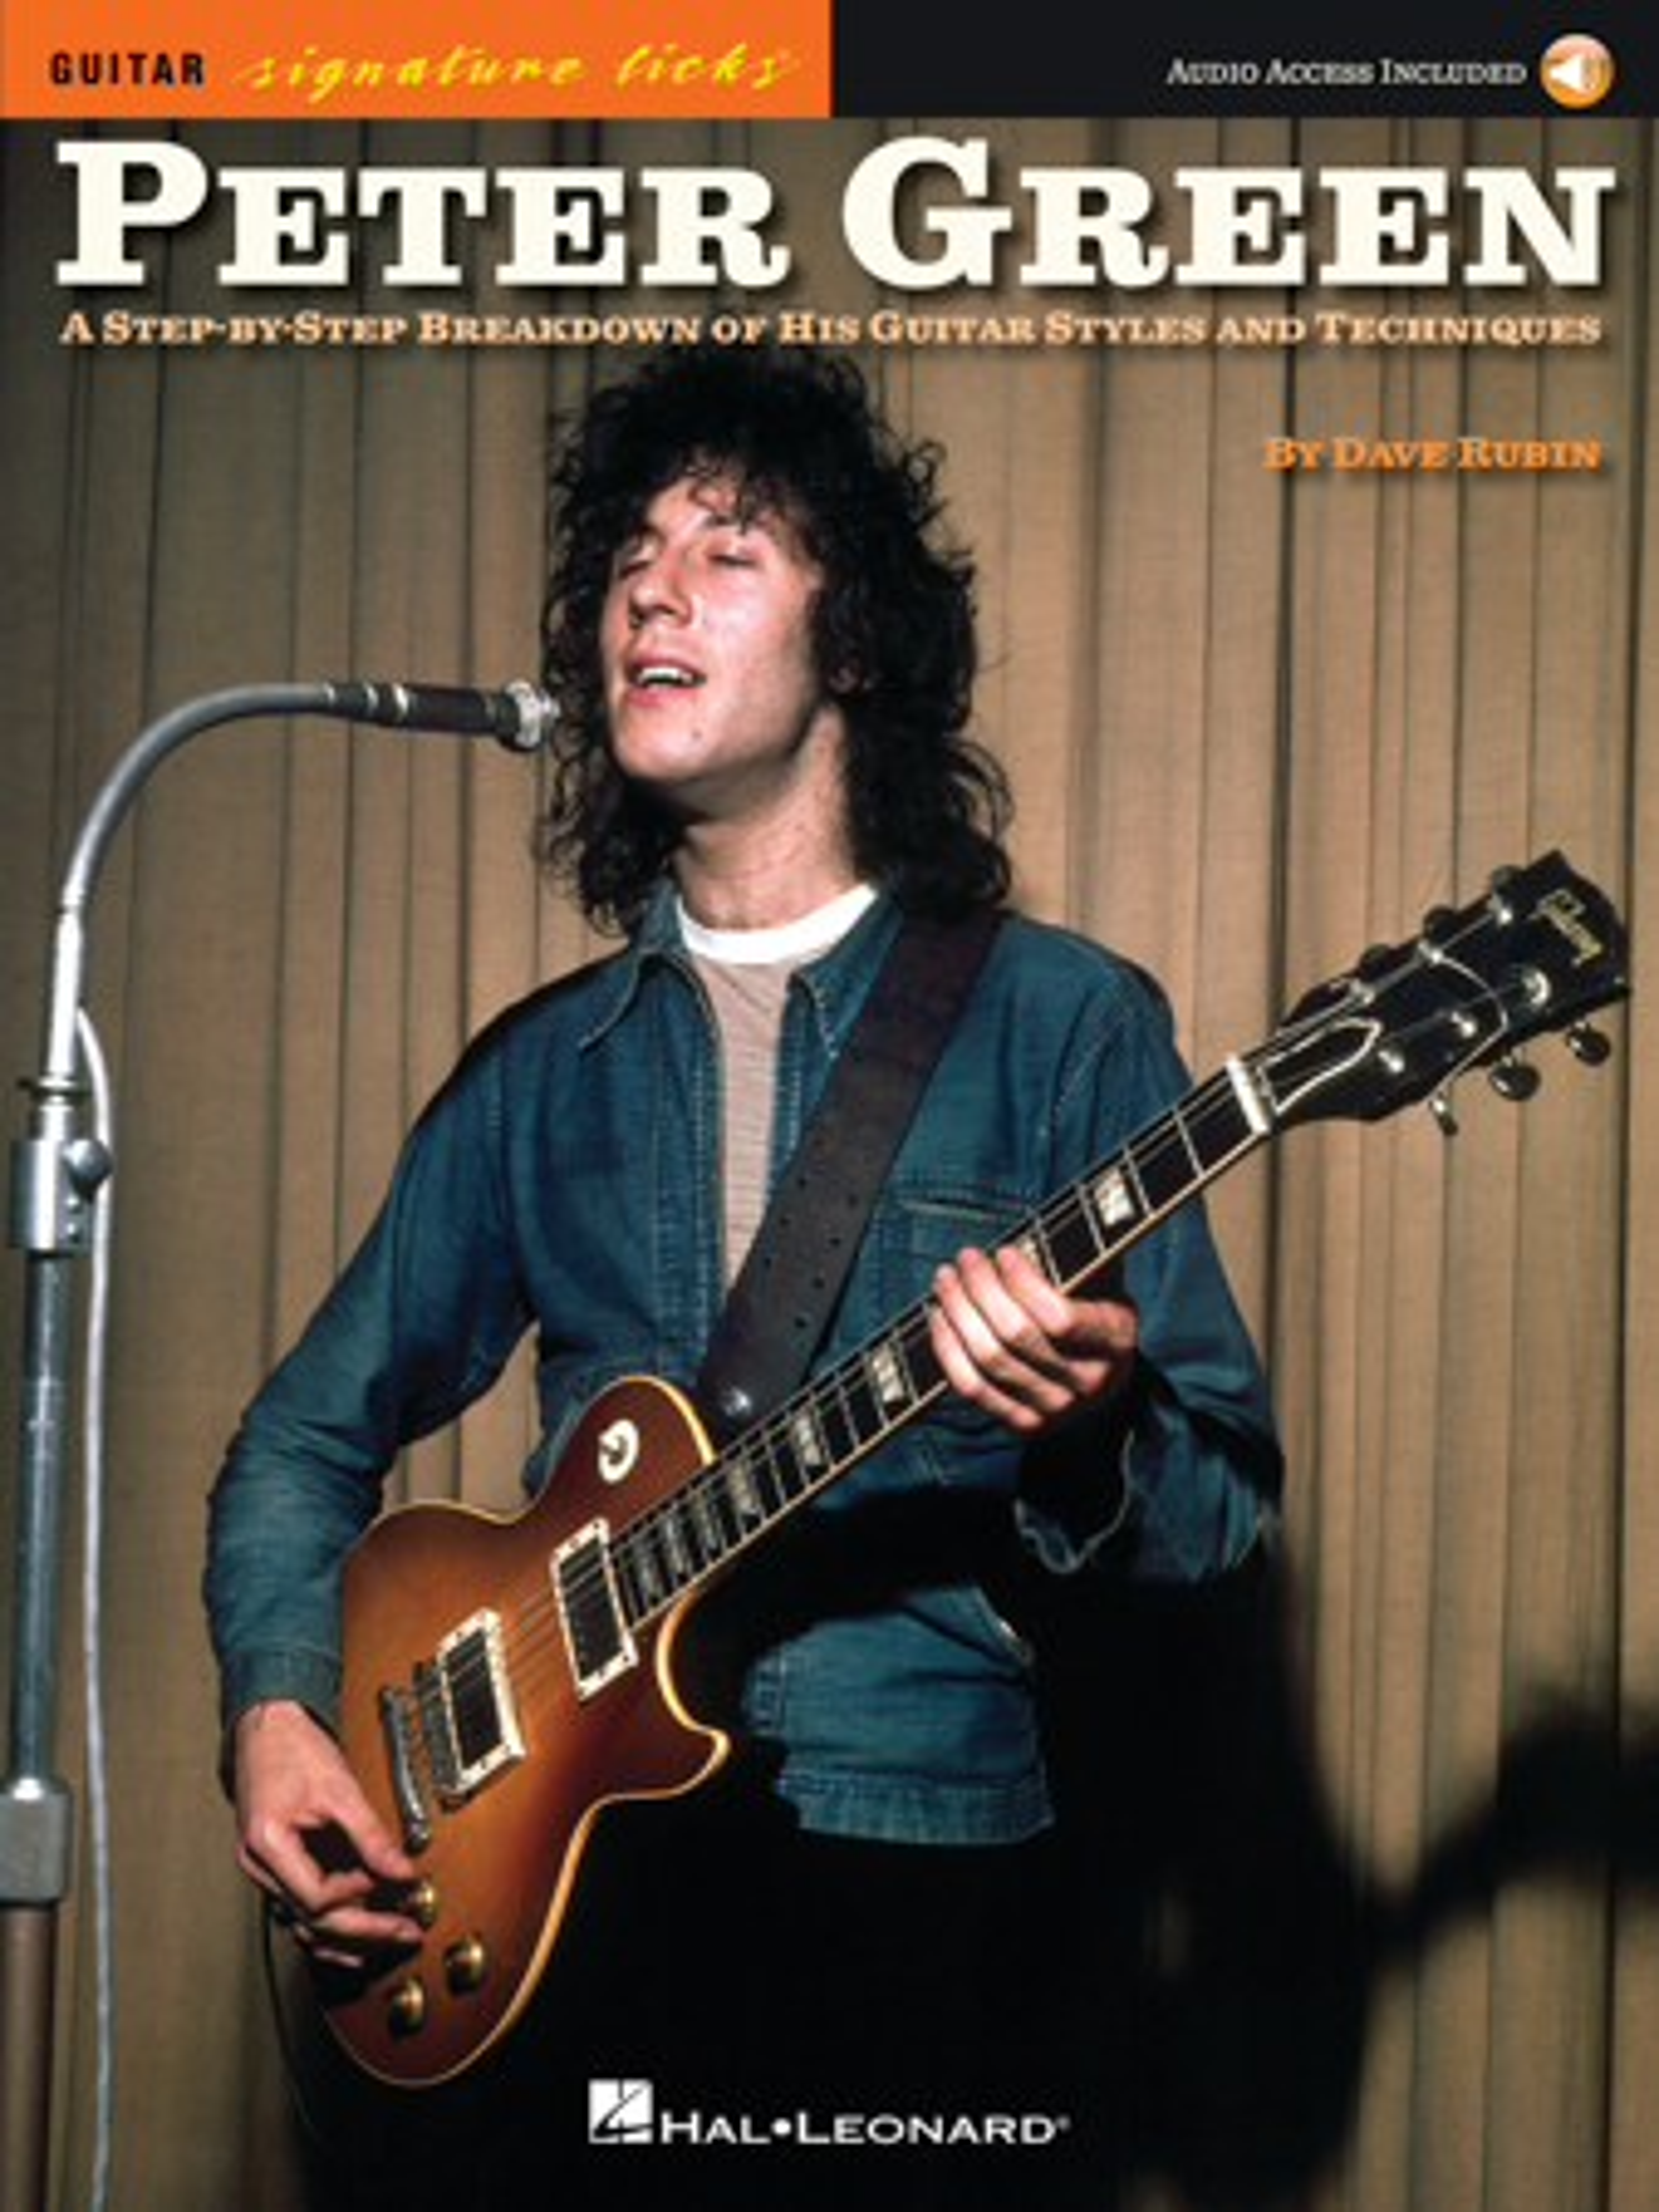 Guitar Signature Licks: Peter Green